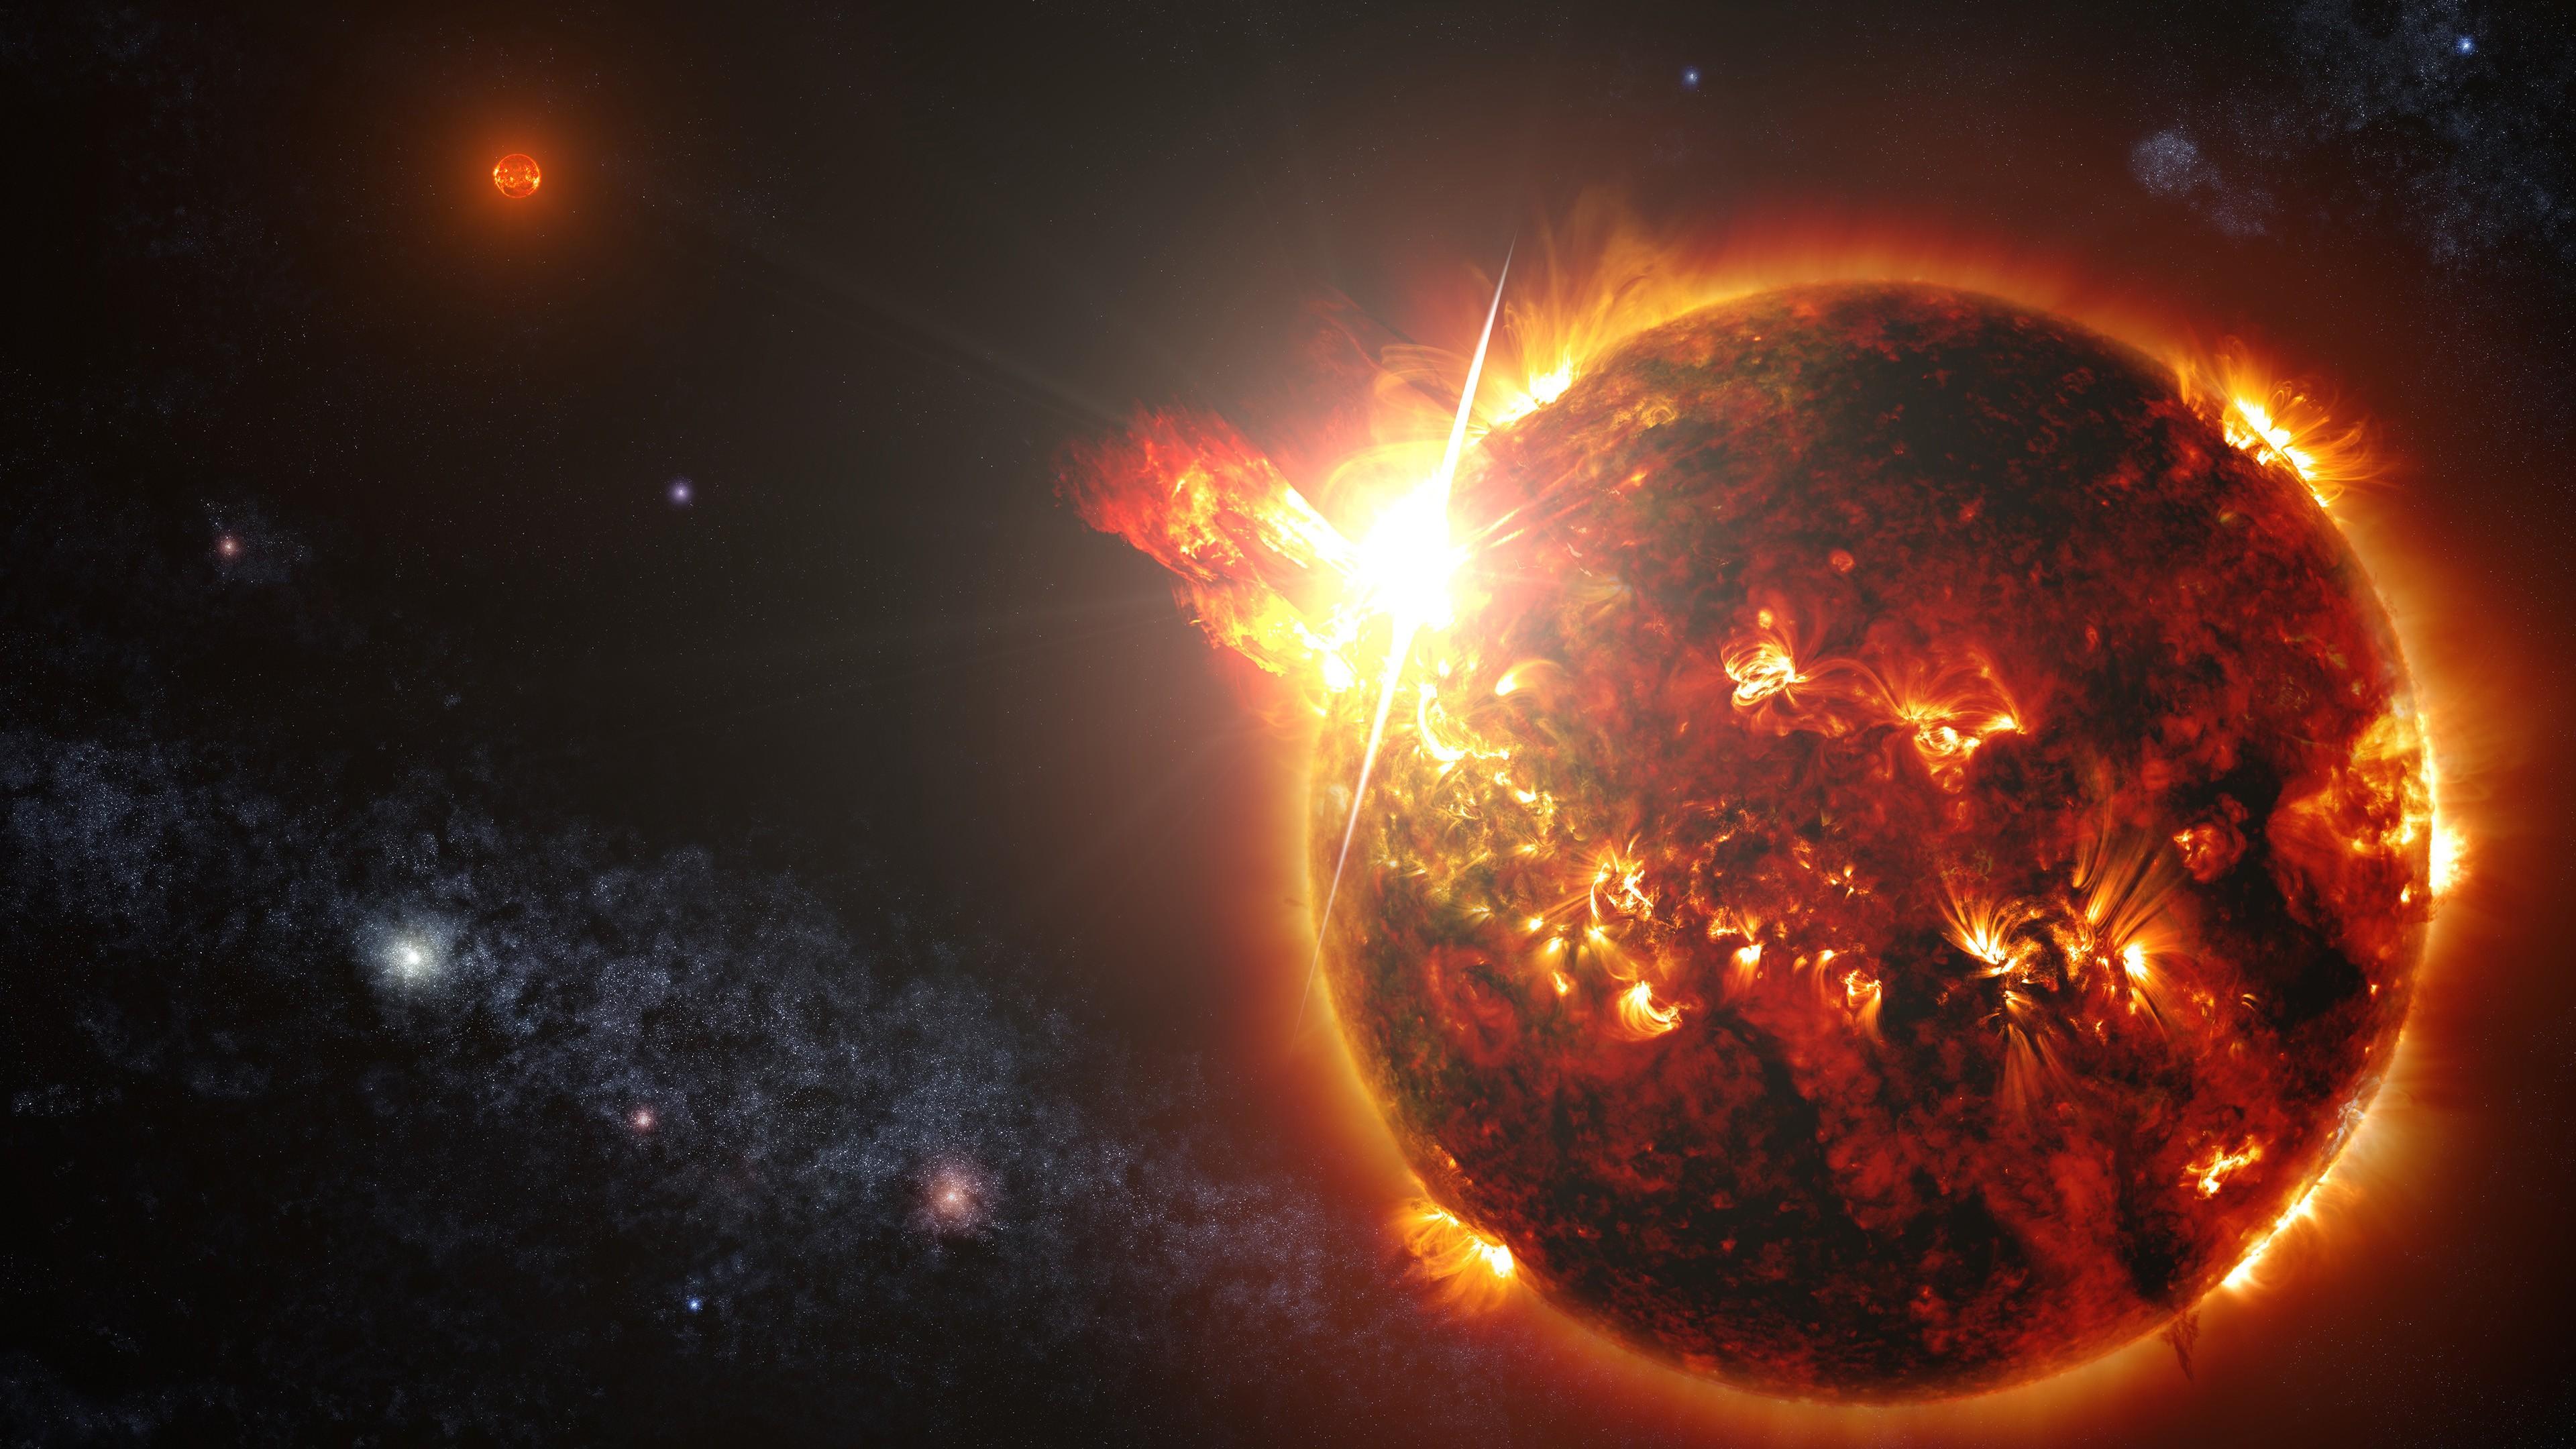 fire planet space wallpaper - photo #3